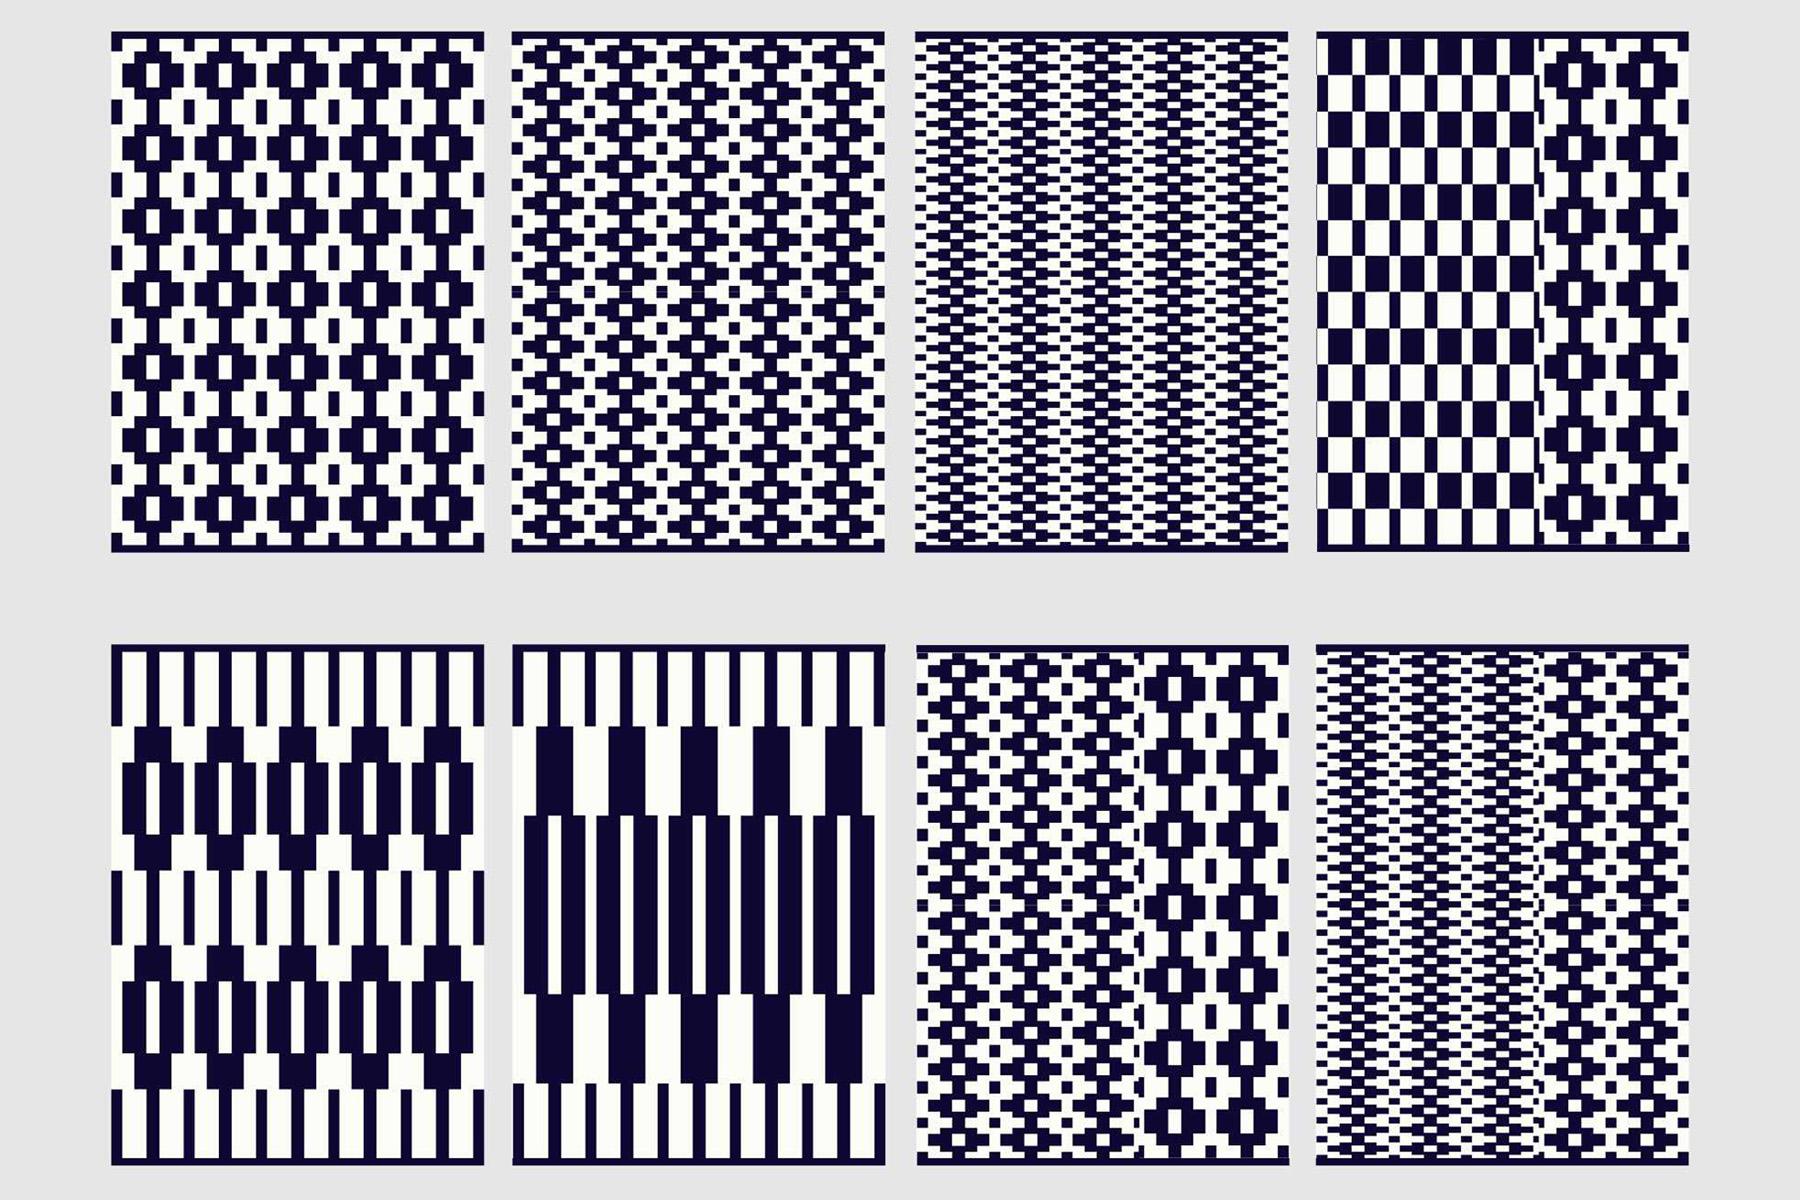 hellodesign-gradics-07.jpg